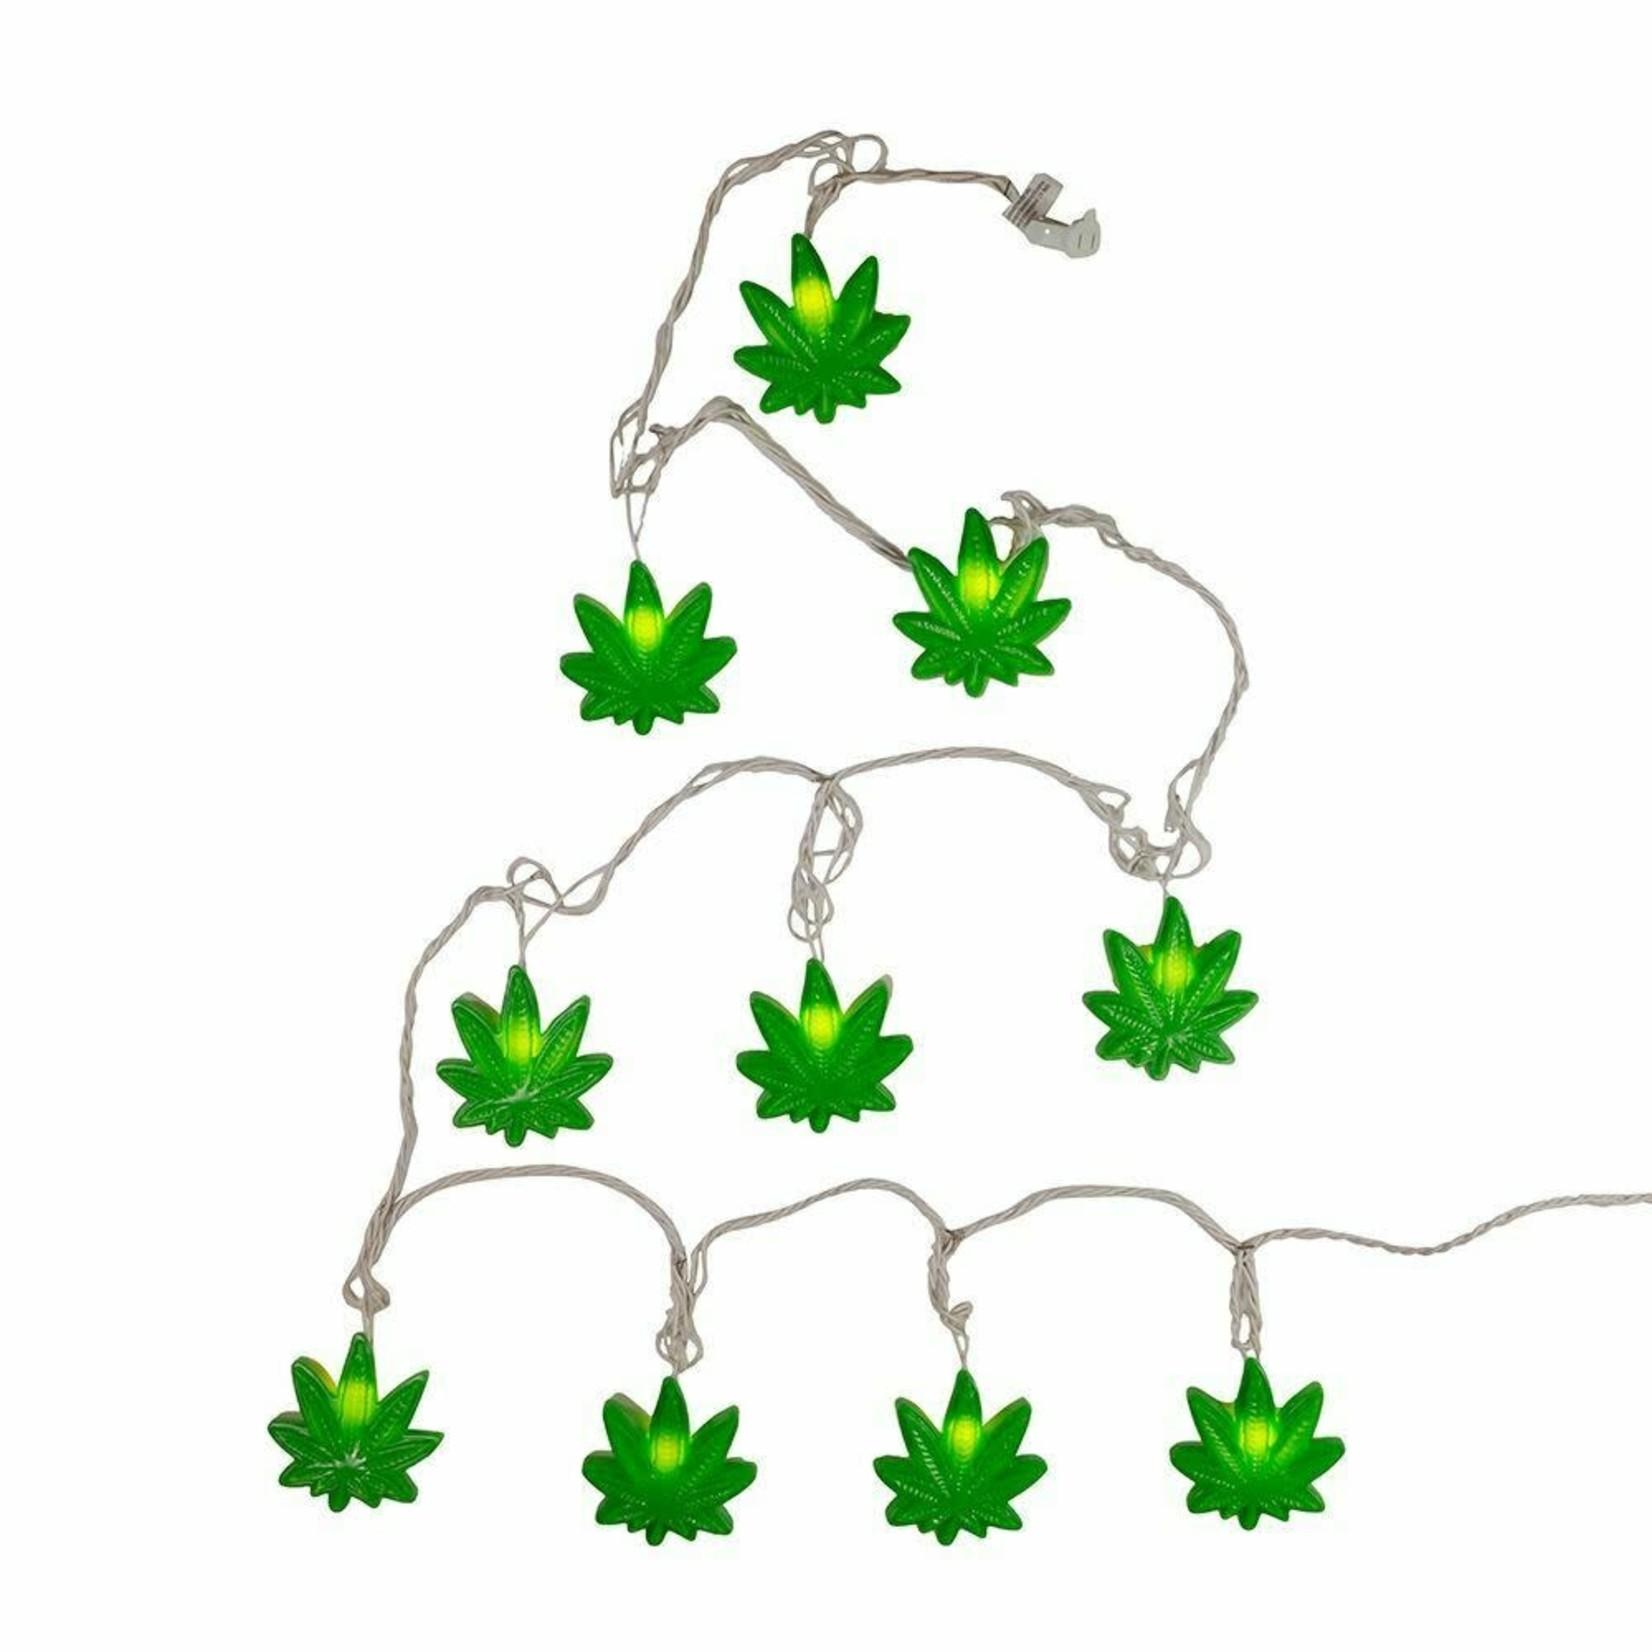 Light Set - Cannabis Leaf